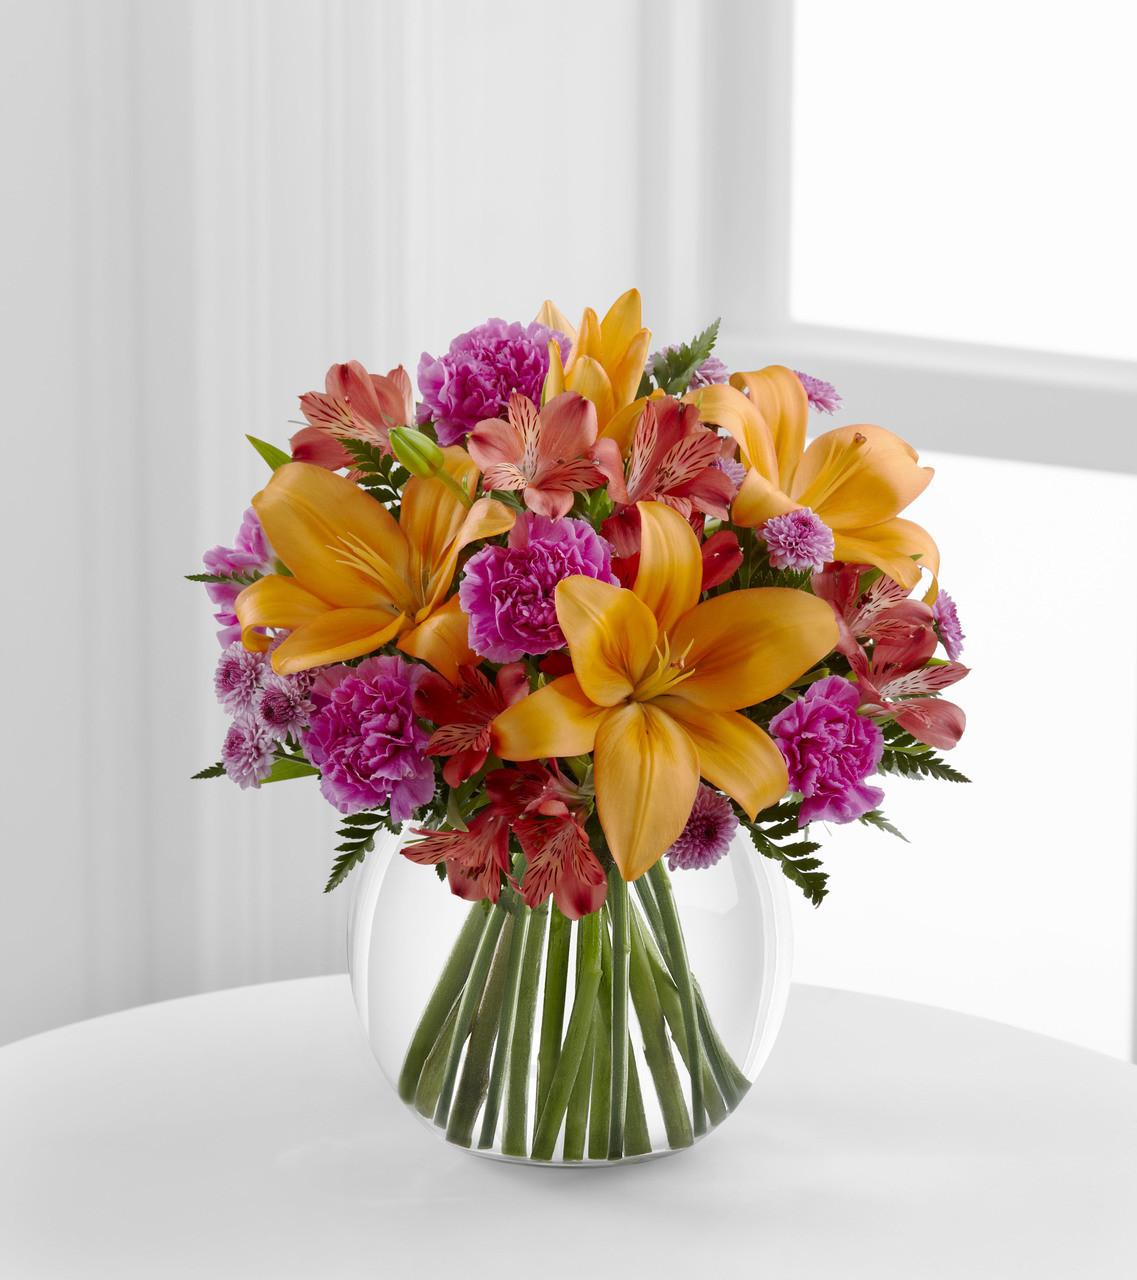 Light of my life bouquet simi valley florist izmirmasajfo